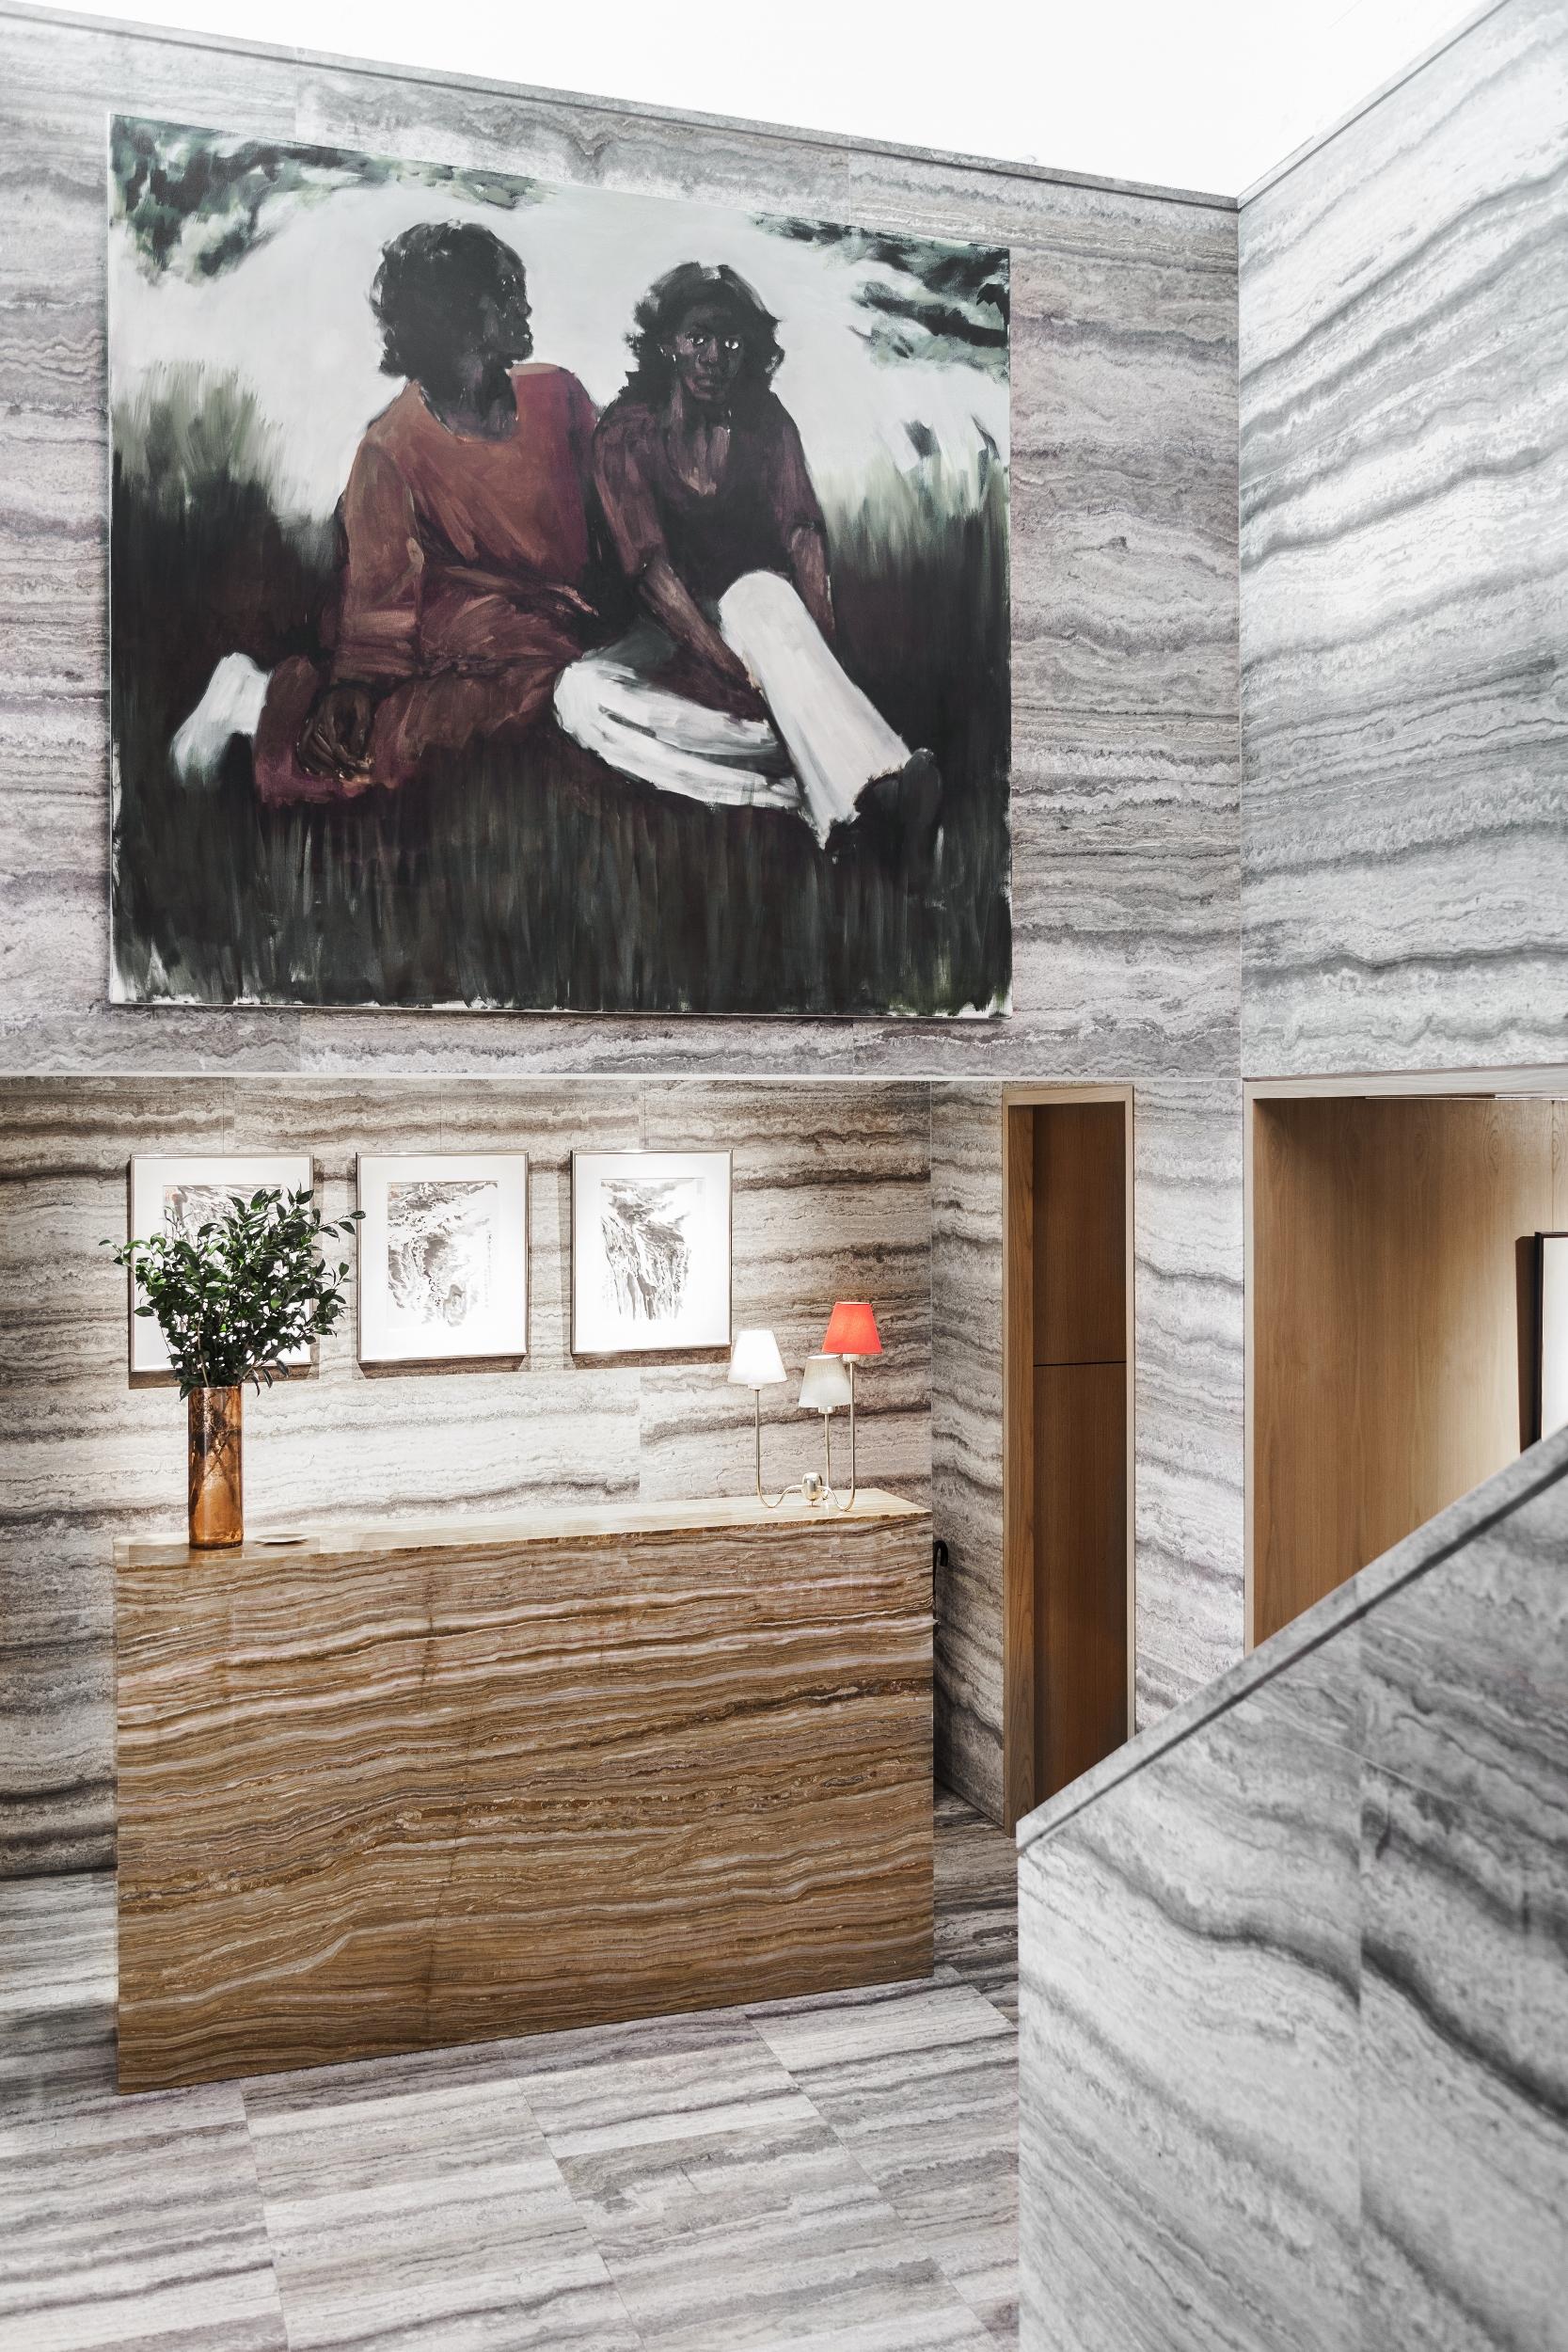 Absolutely marblelous... walls, stairs, floors and reception desk are encased in sleek travertine